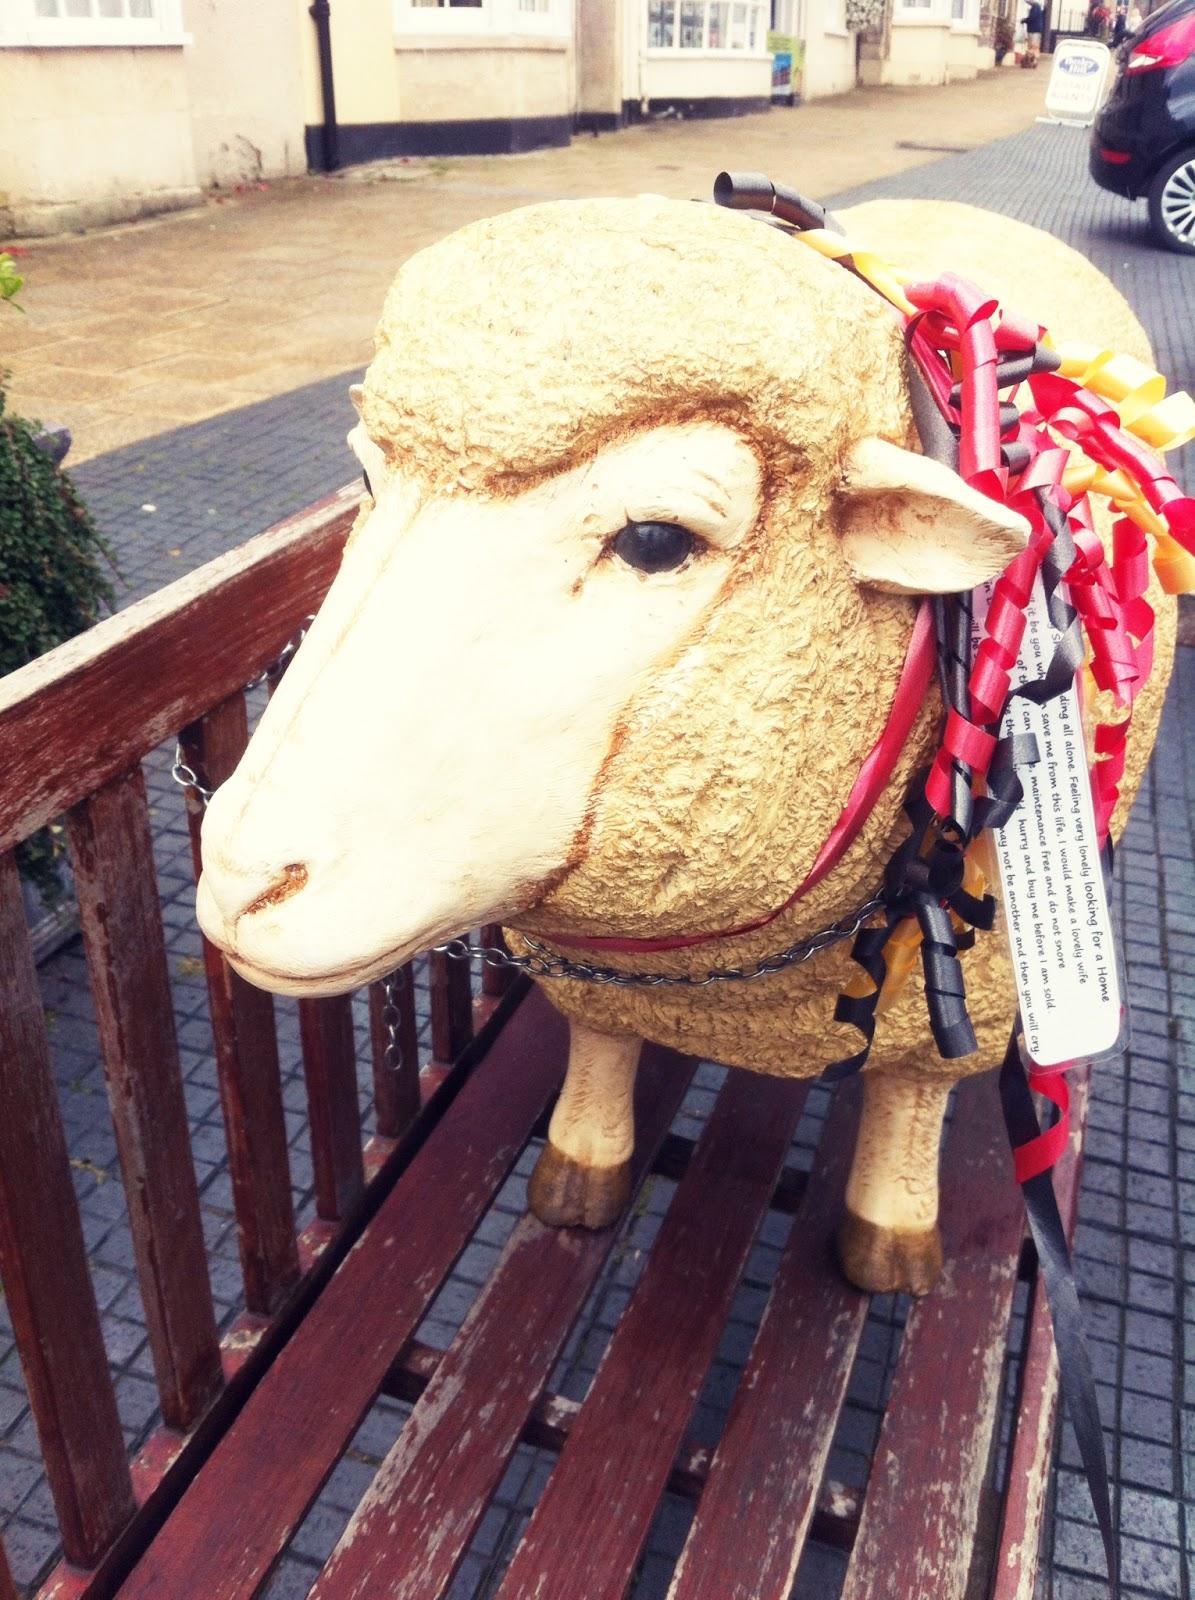 The Sodbury Sheep Search